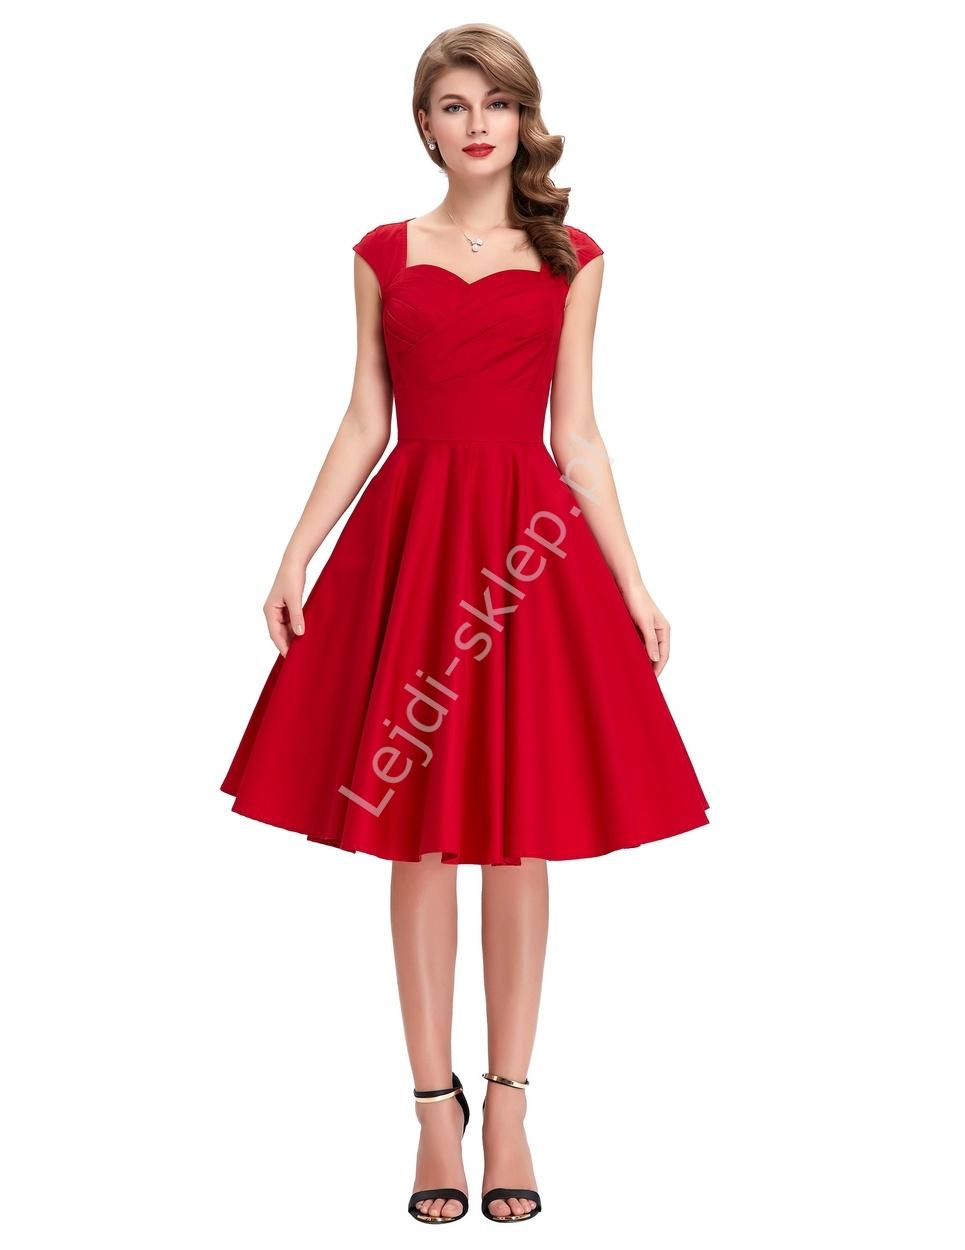 ad244b9eb3 Bawełniana sukienka pin-up czerwona